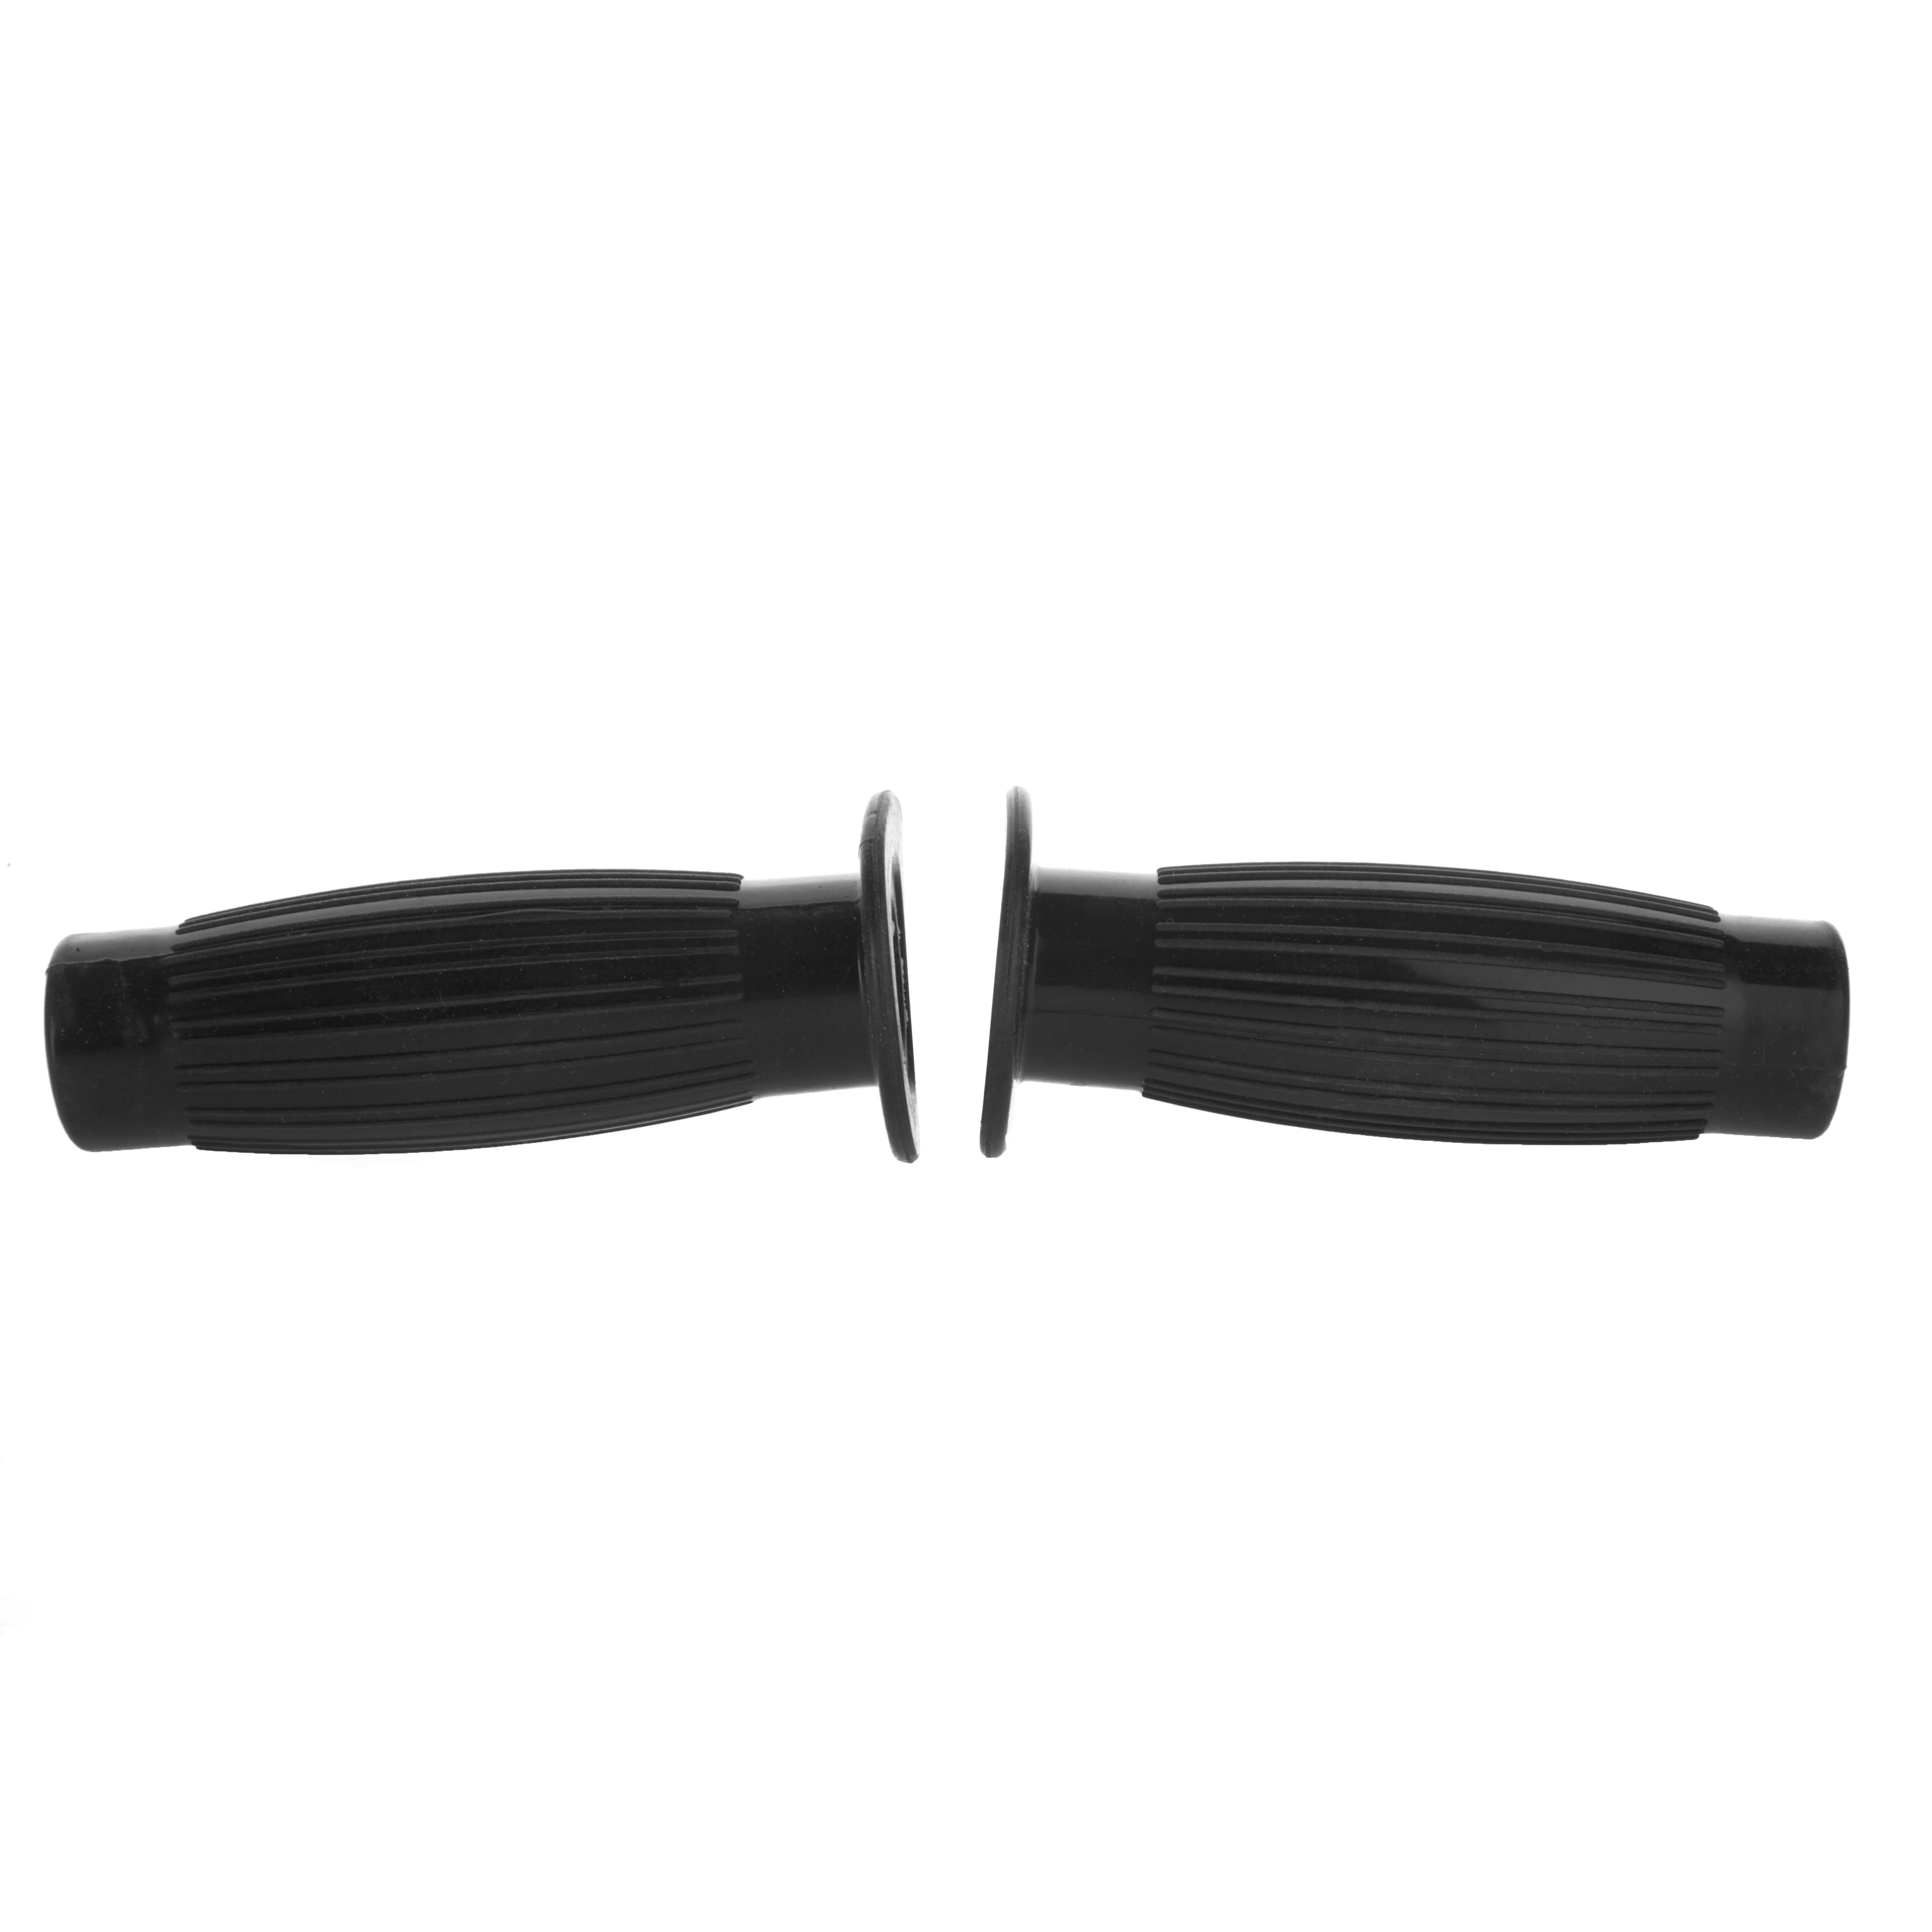 Handlebar Grips RACETEK - Pair